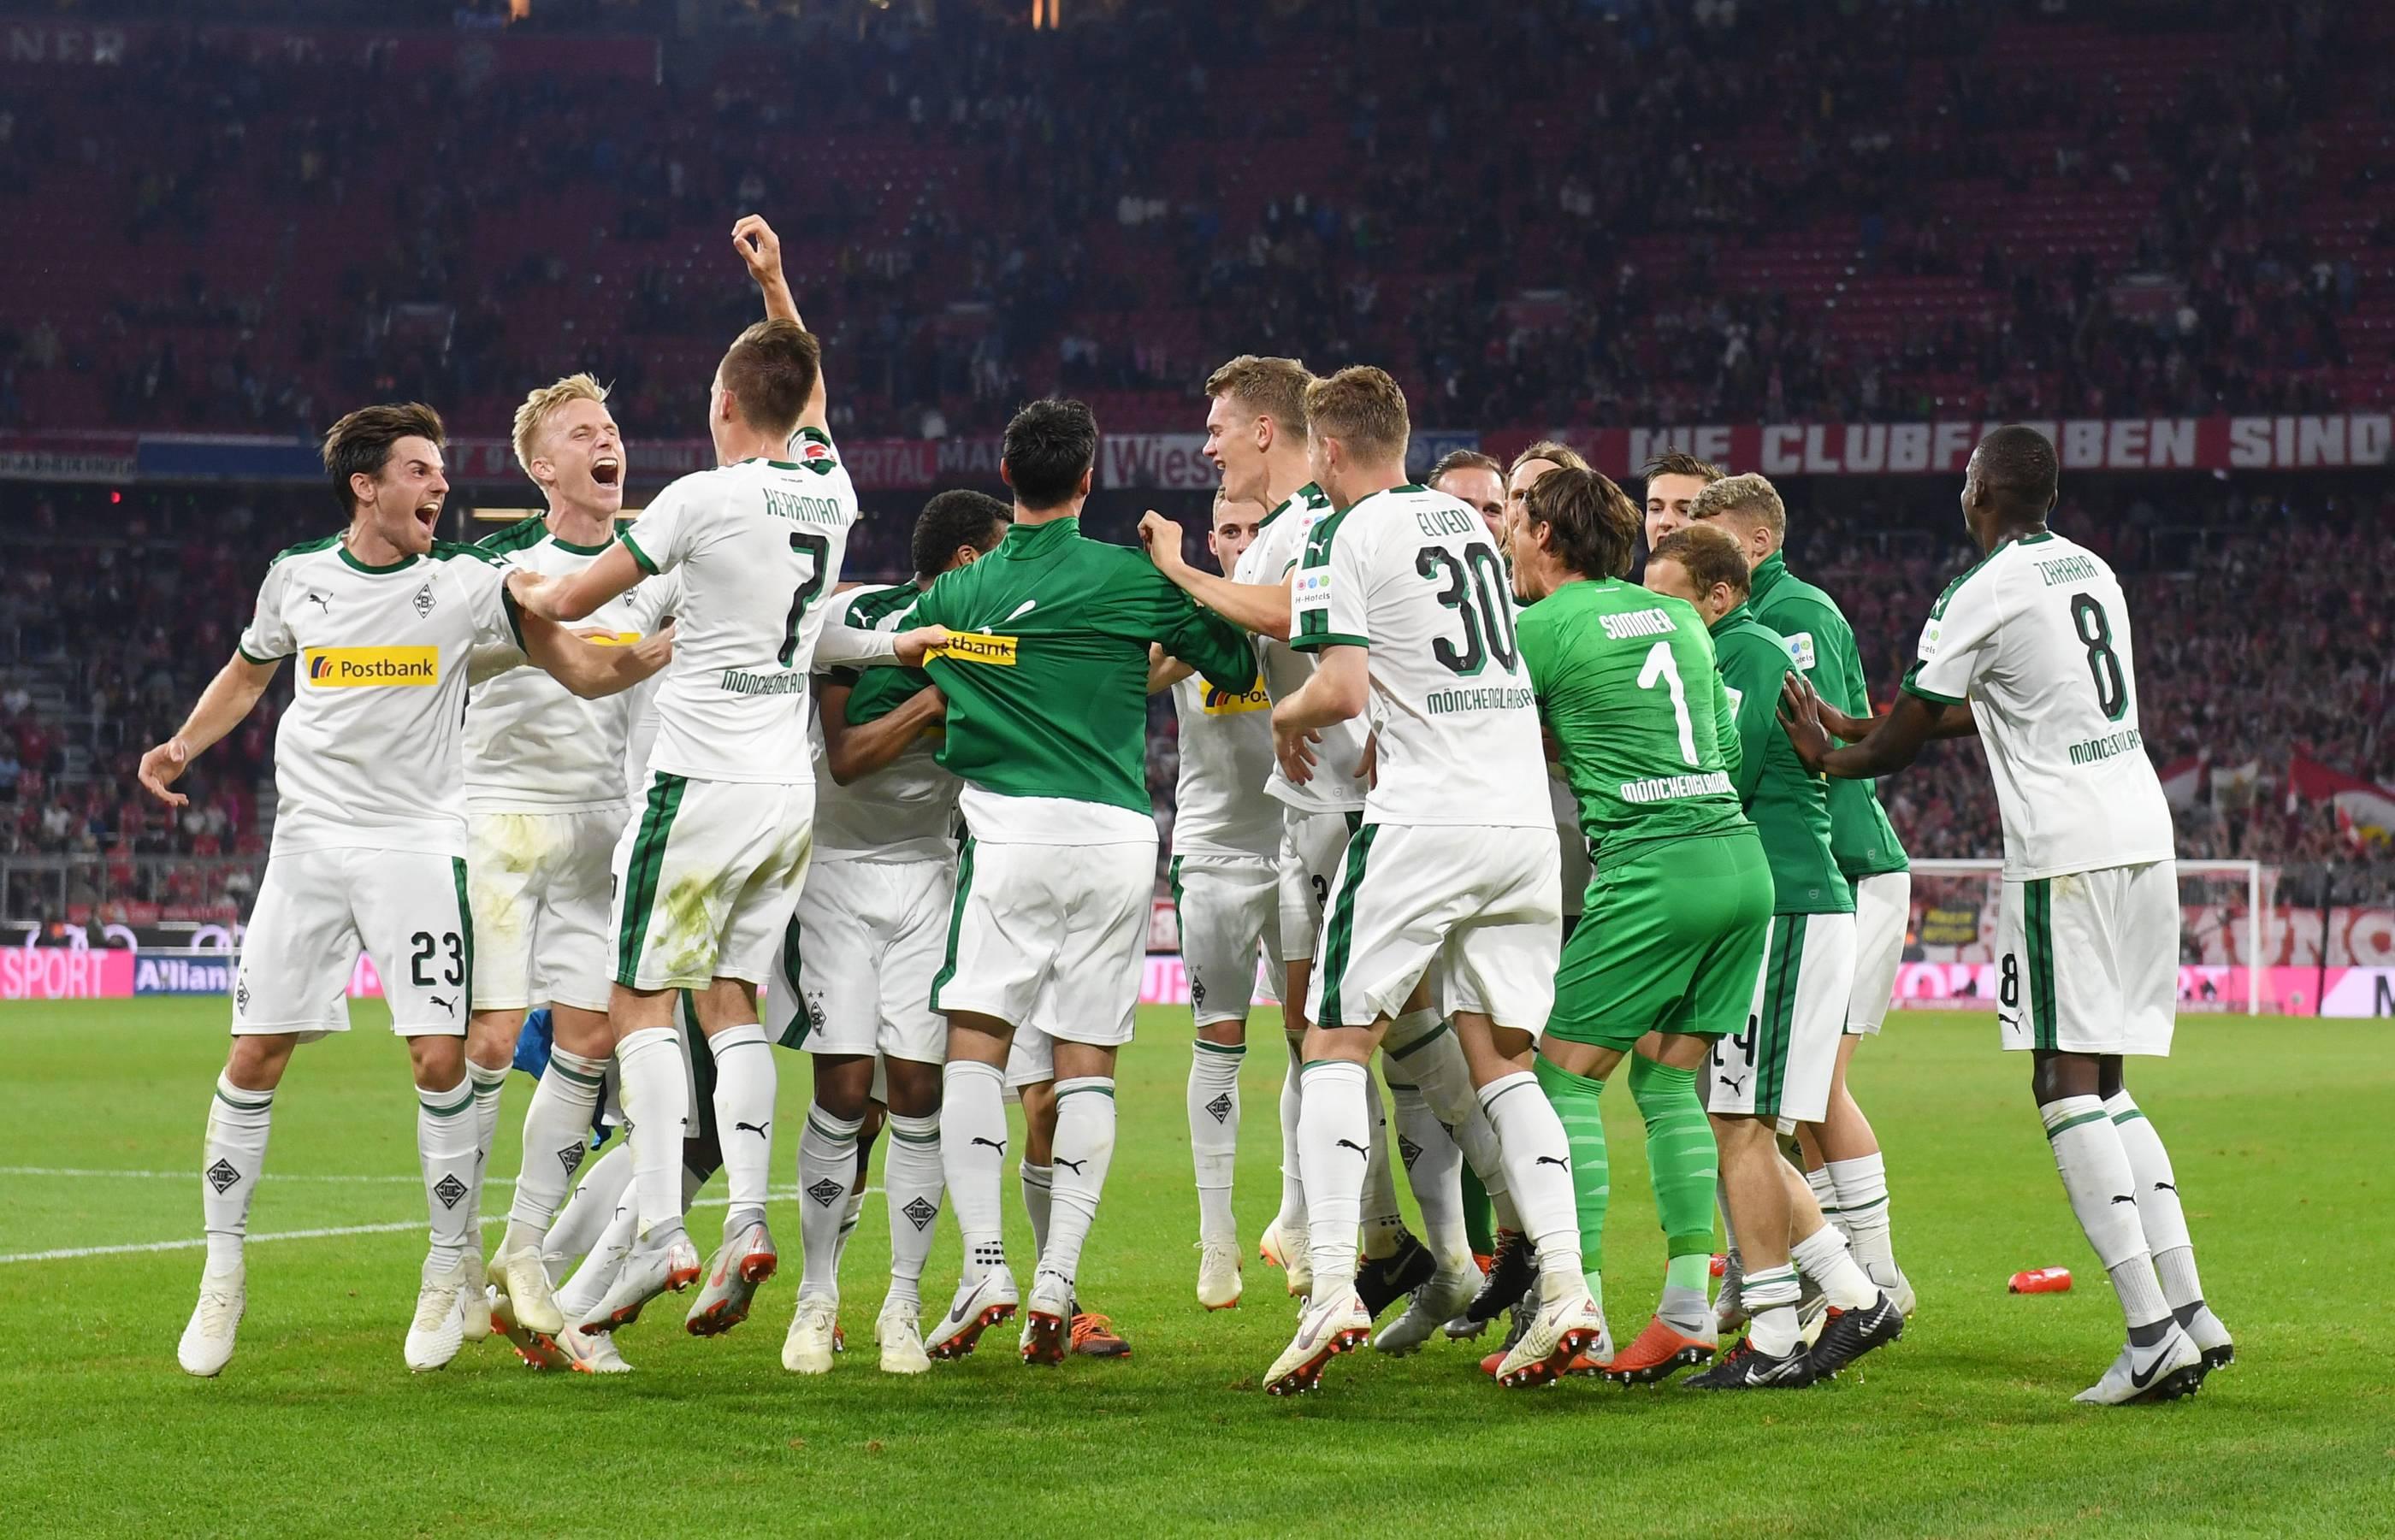 Bayern Gegen Gladbach